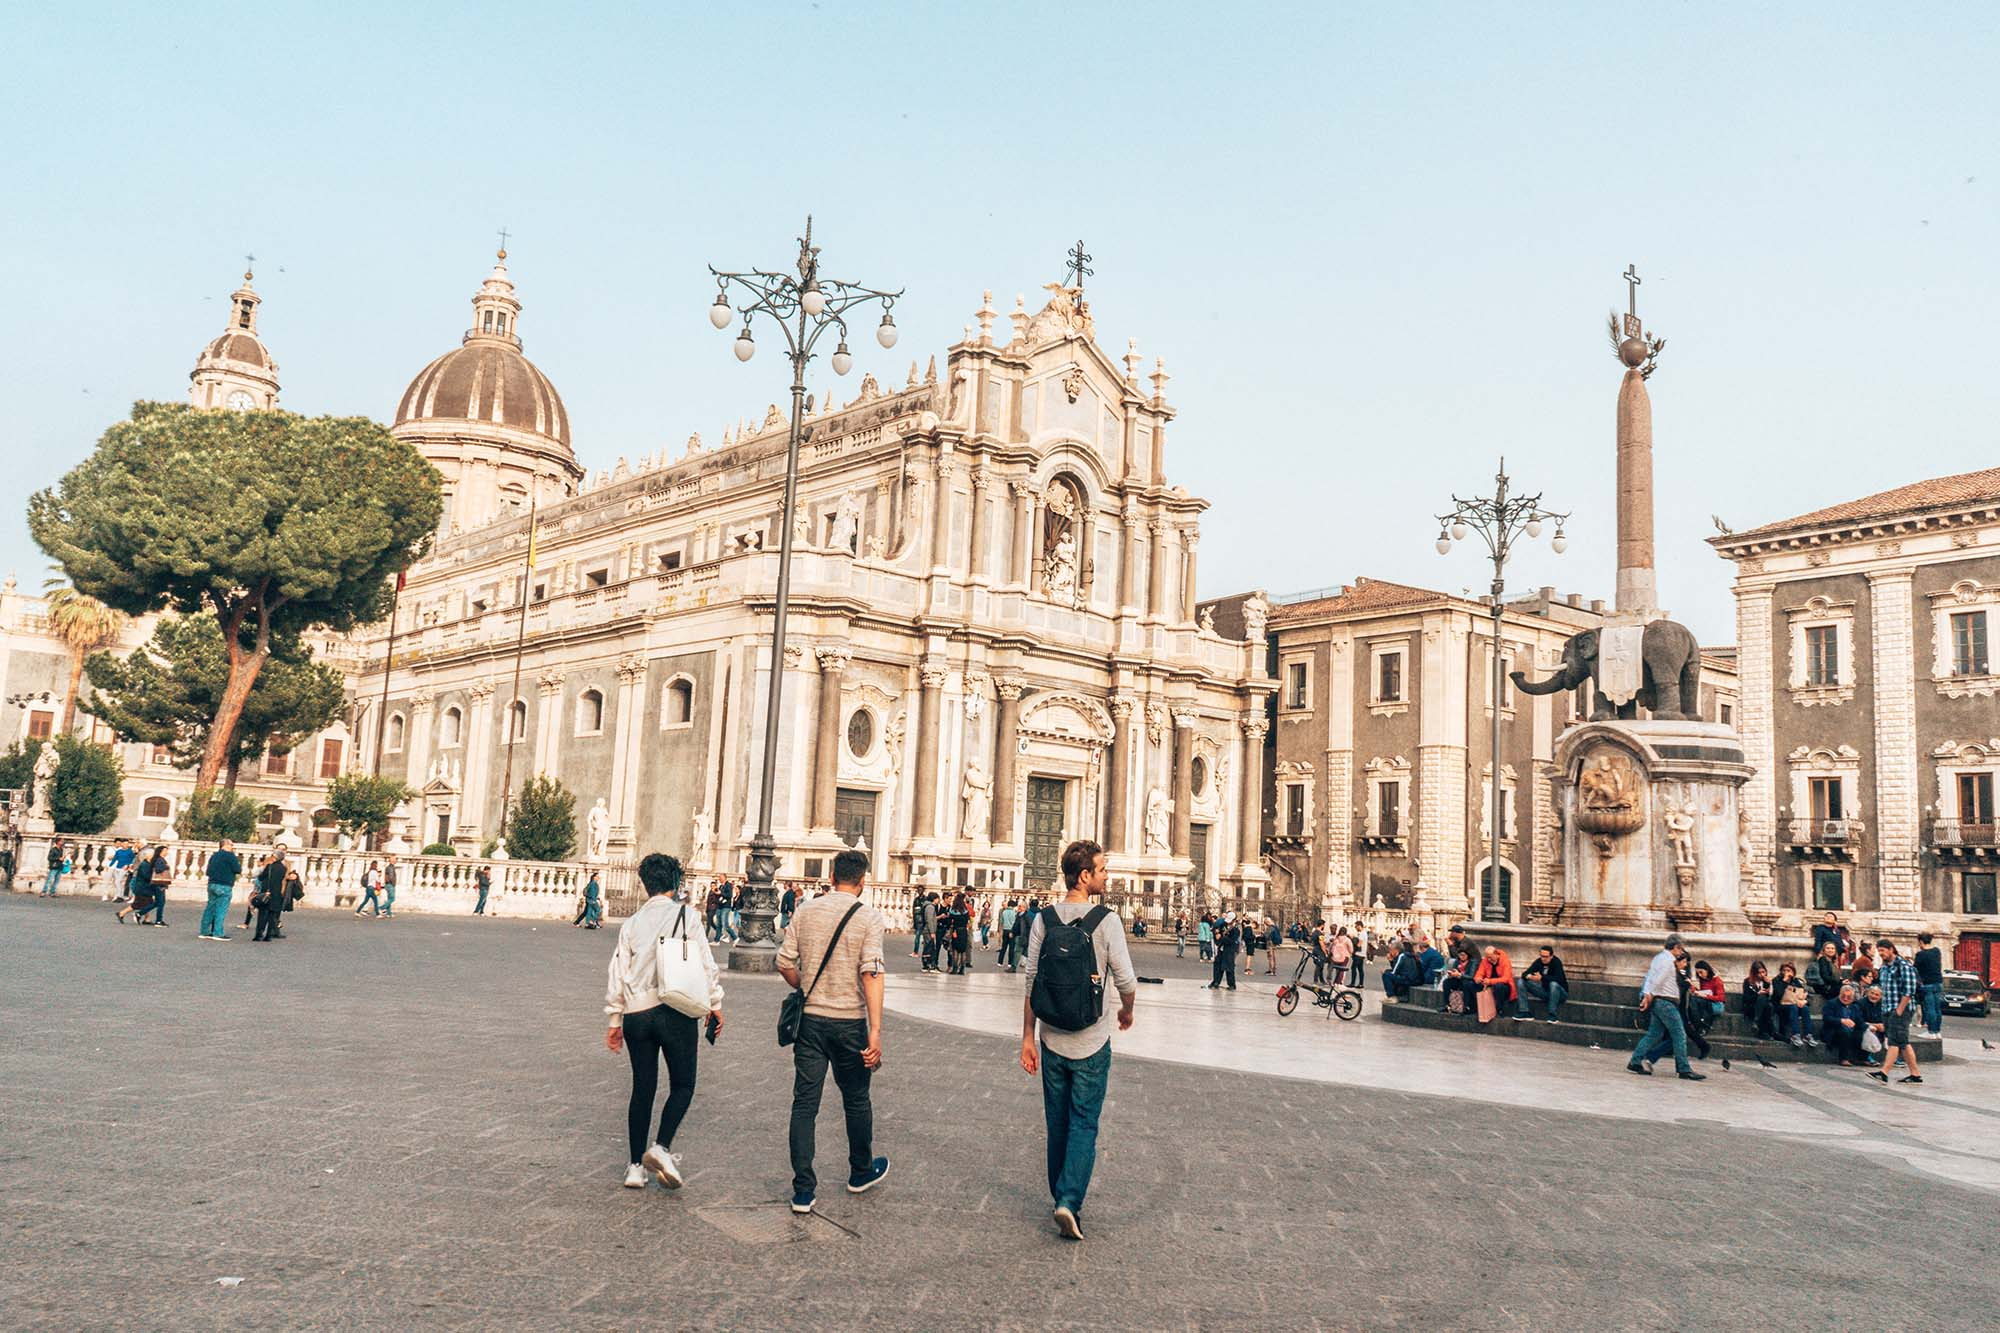 Sicily Town Centre